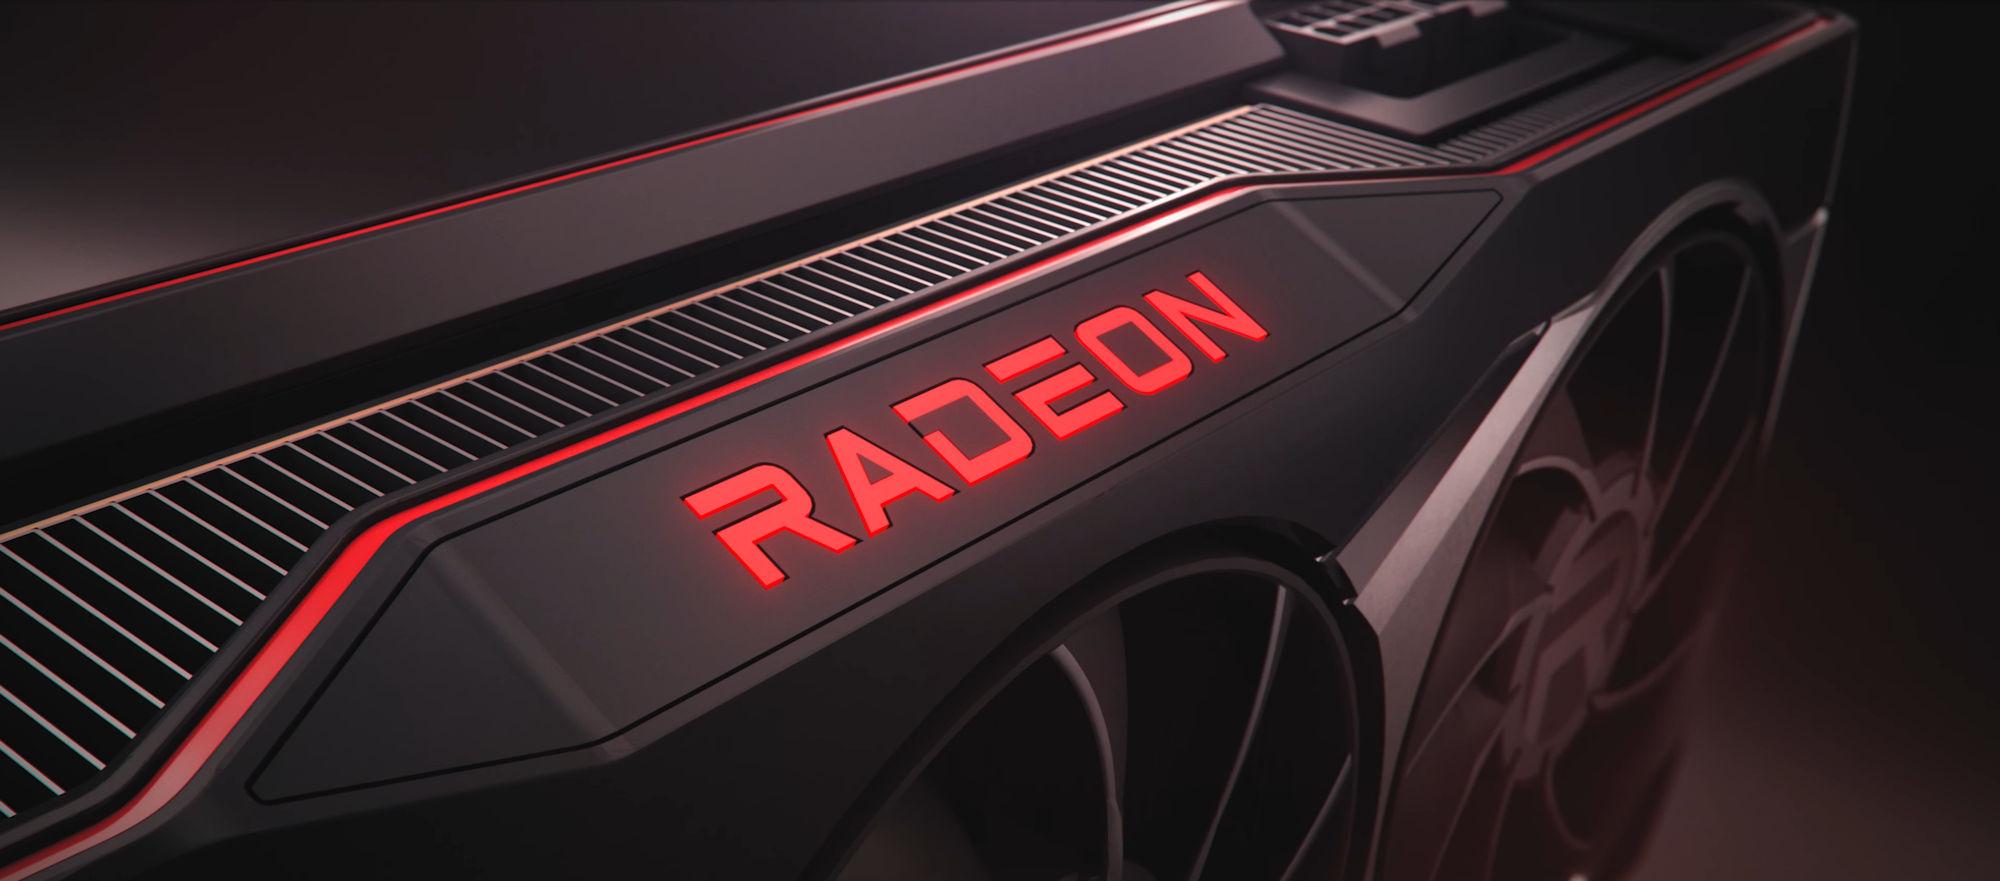 AIDA64 gets support for GeForce RTX 3050 (Ti) and Radeon RX 6600 (XT) – VideoCardz.com